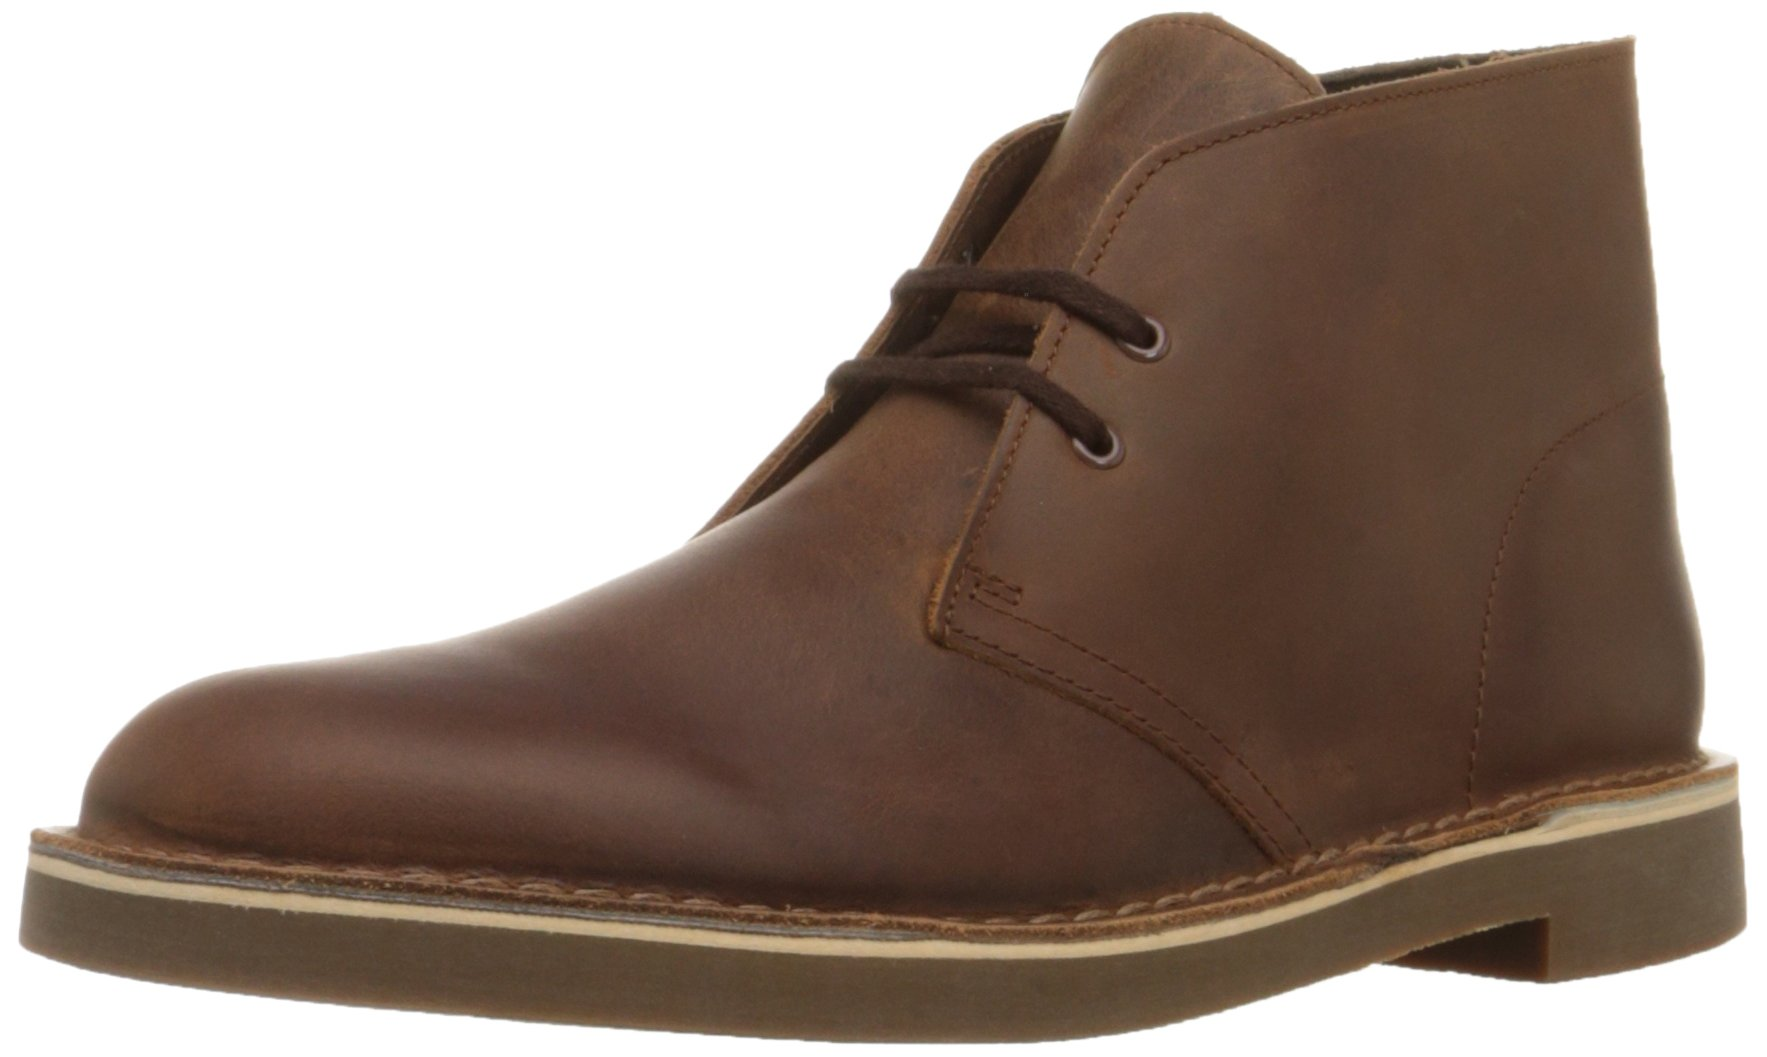 Clarks Men's Bushacre 2 Chukka Boot,Dark Brown,9 M US